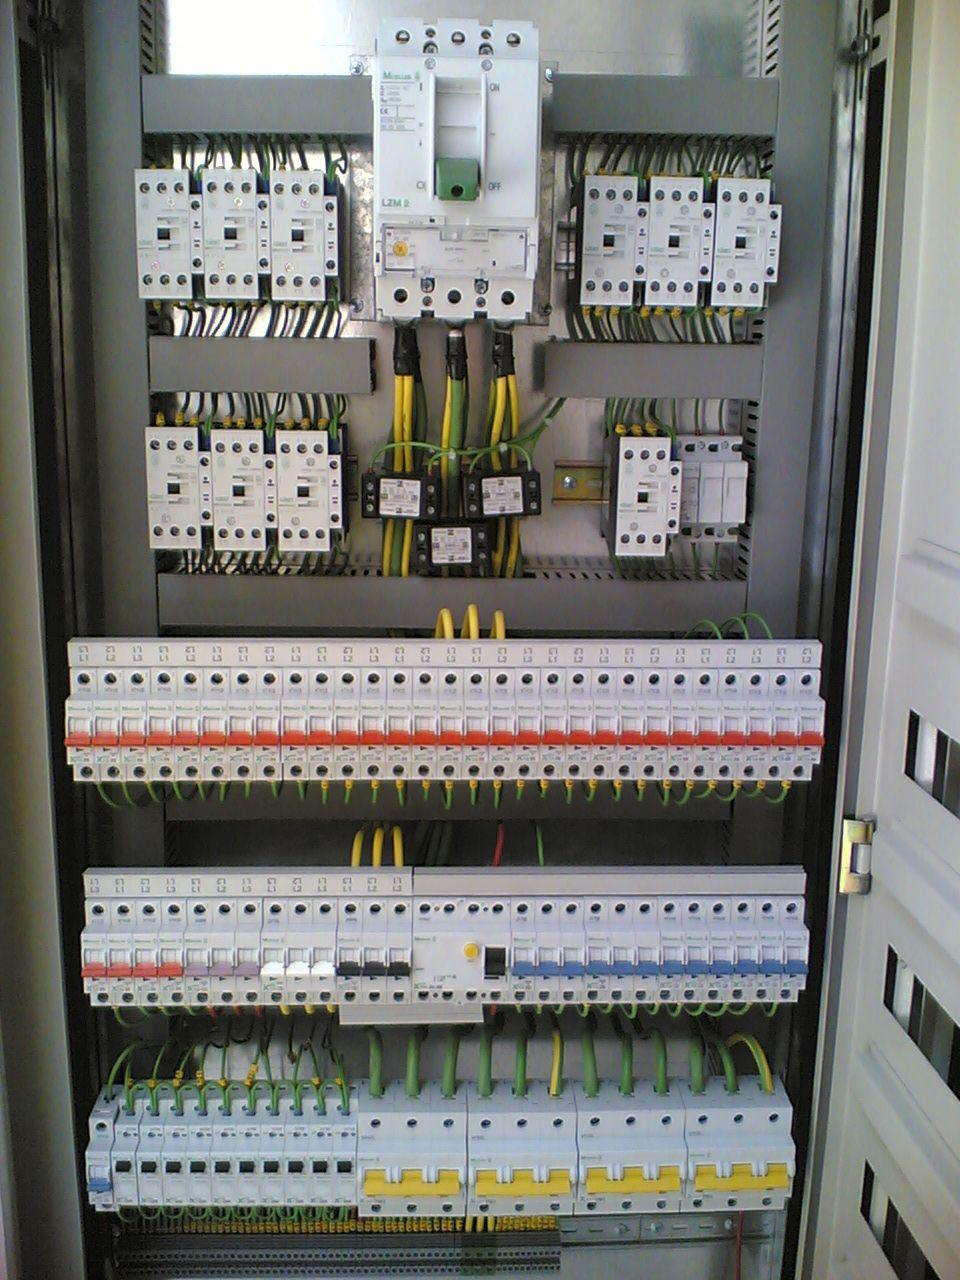 Pin John Deere Key Switch Wiring Diagram On Pinterest